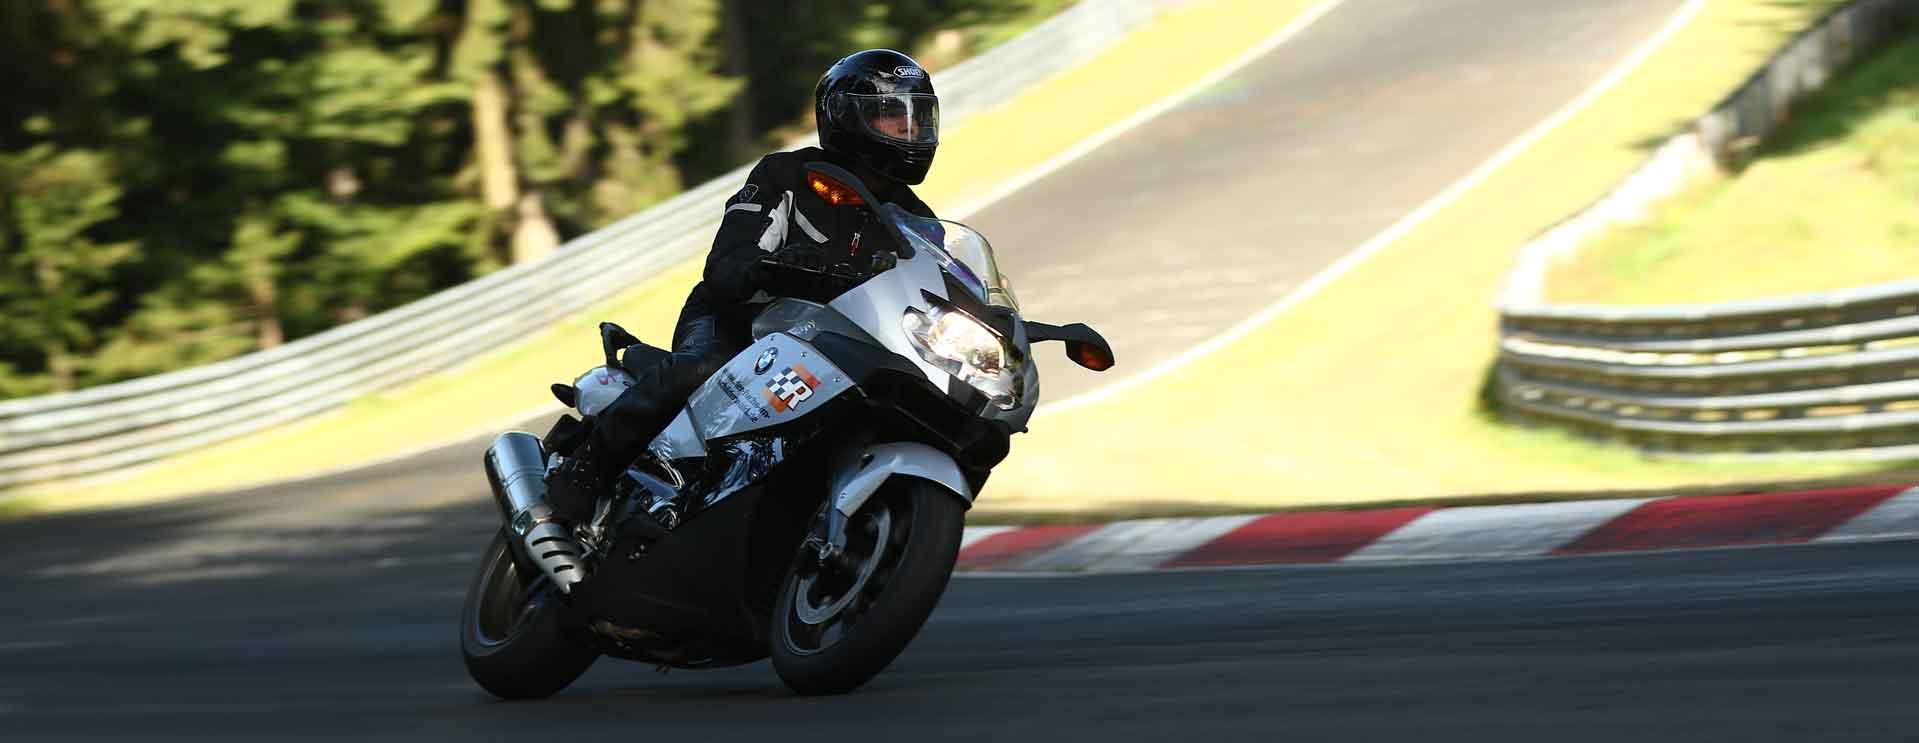 motorrad auf nürburgring nordschleife